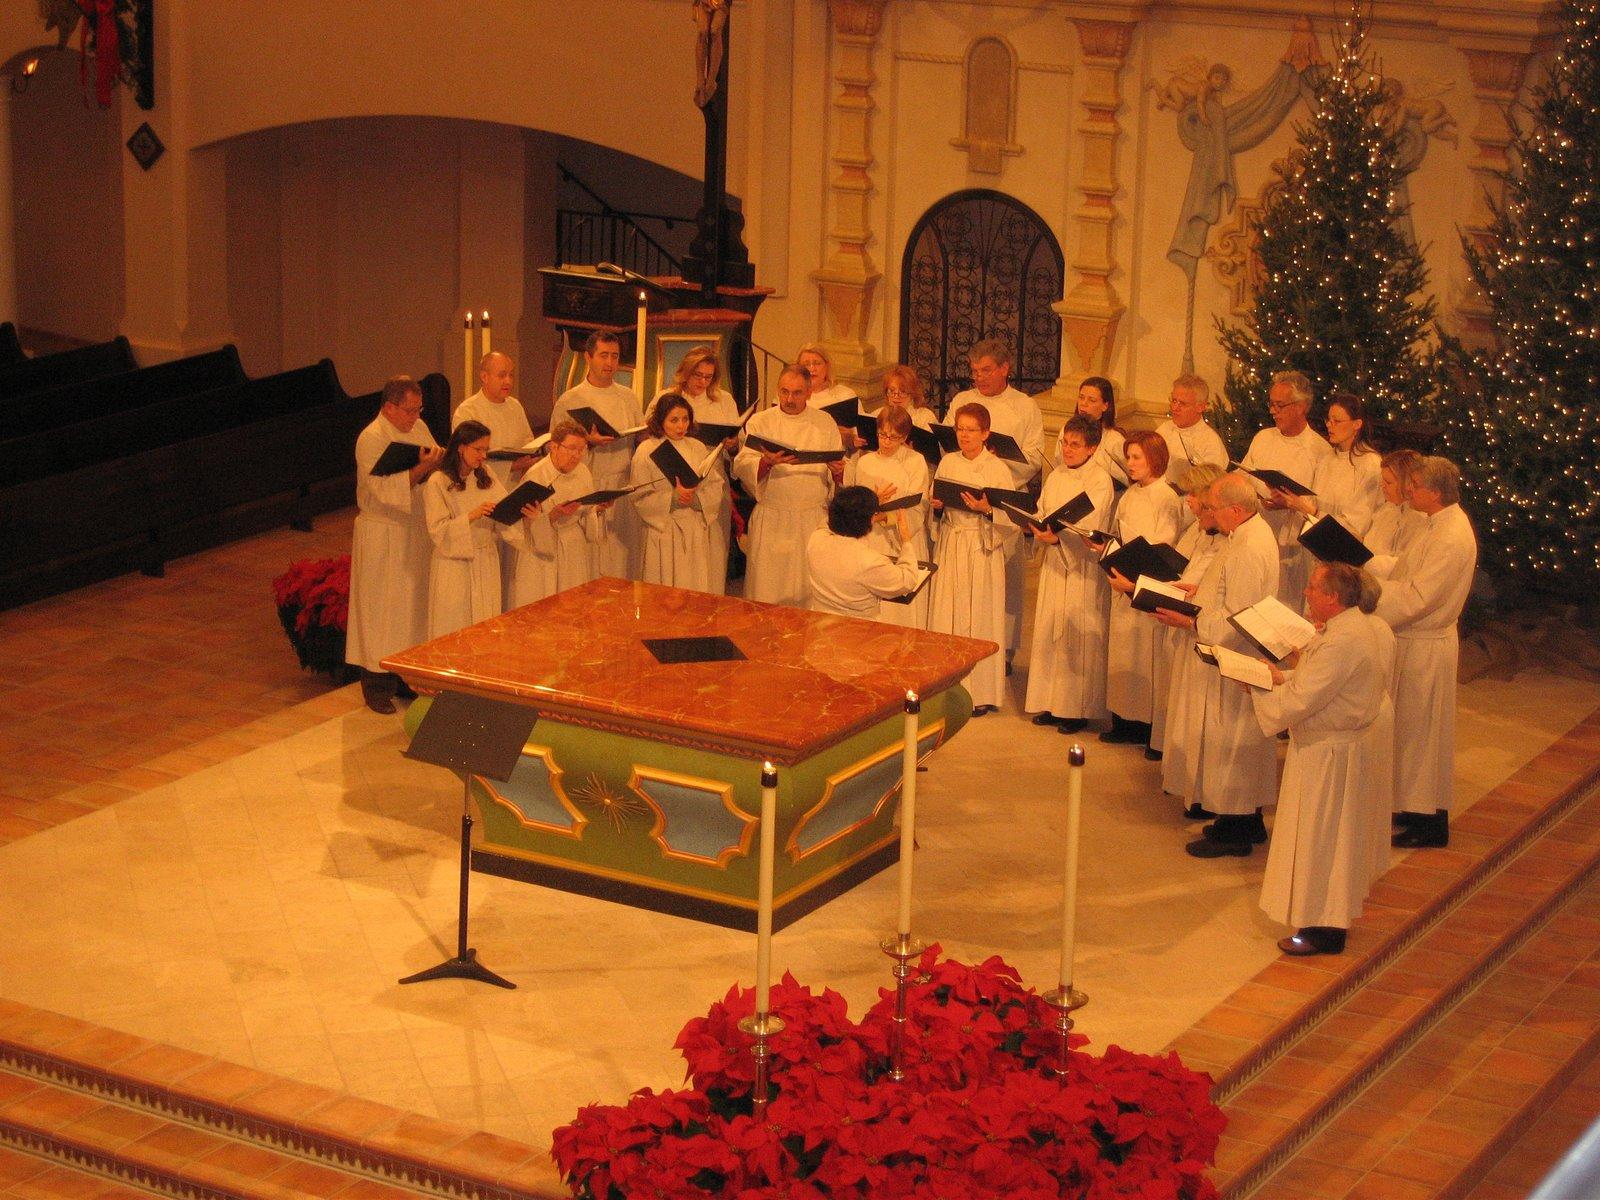 Visitation Chior Midnight Mass Concert Christmas Eve 2007